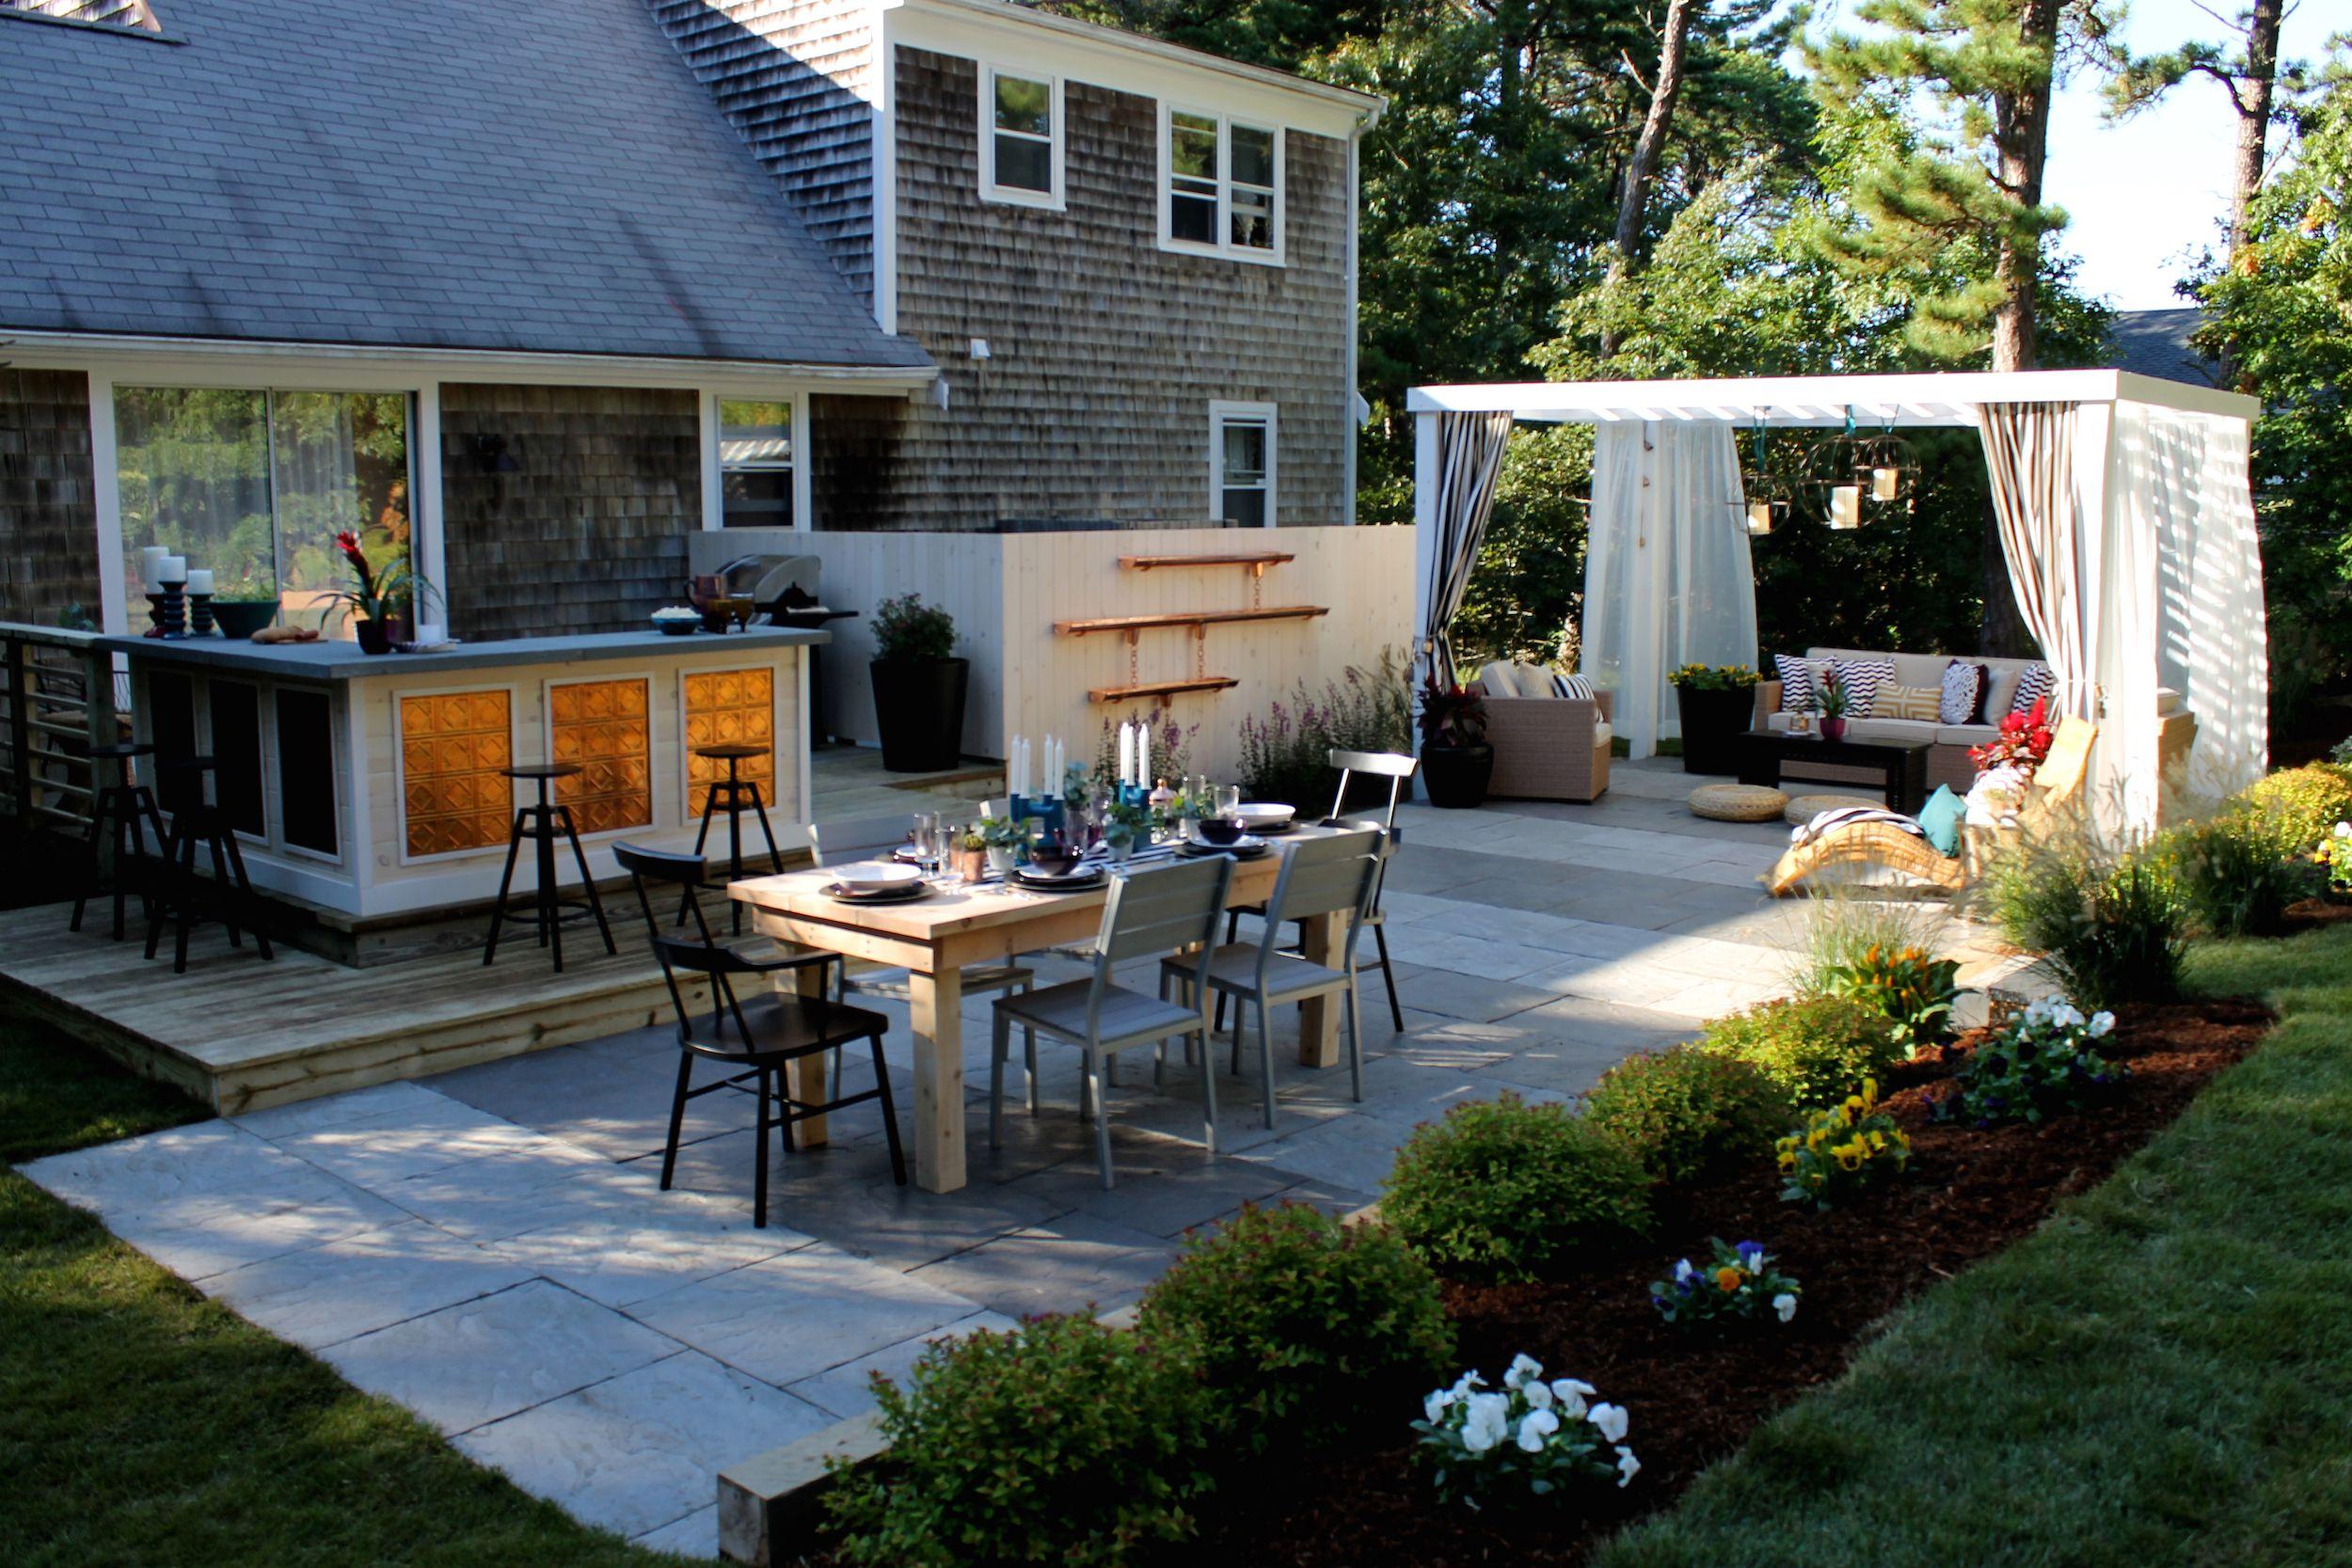 17 low maintenance landscaping ideas easy backyard landscape rh elledecor com